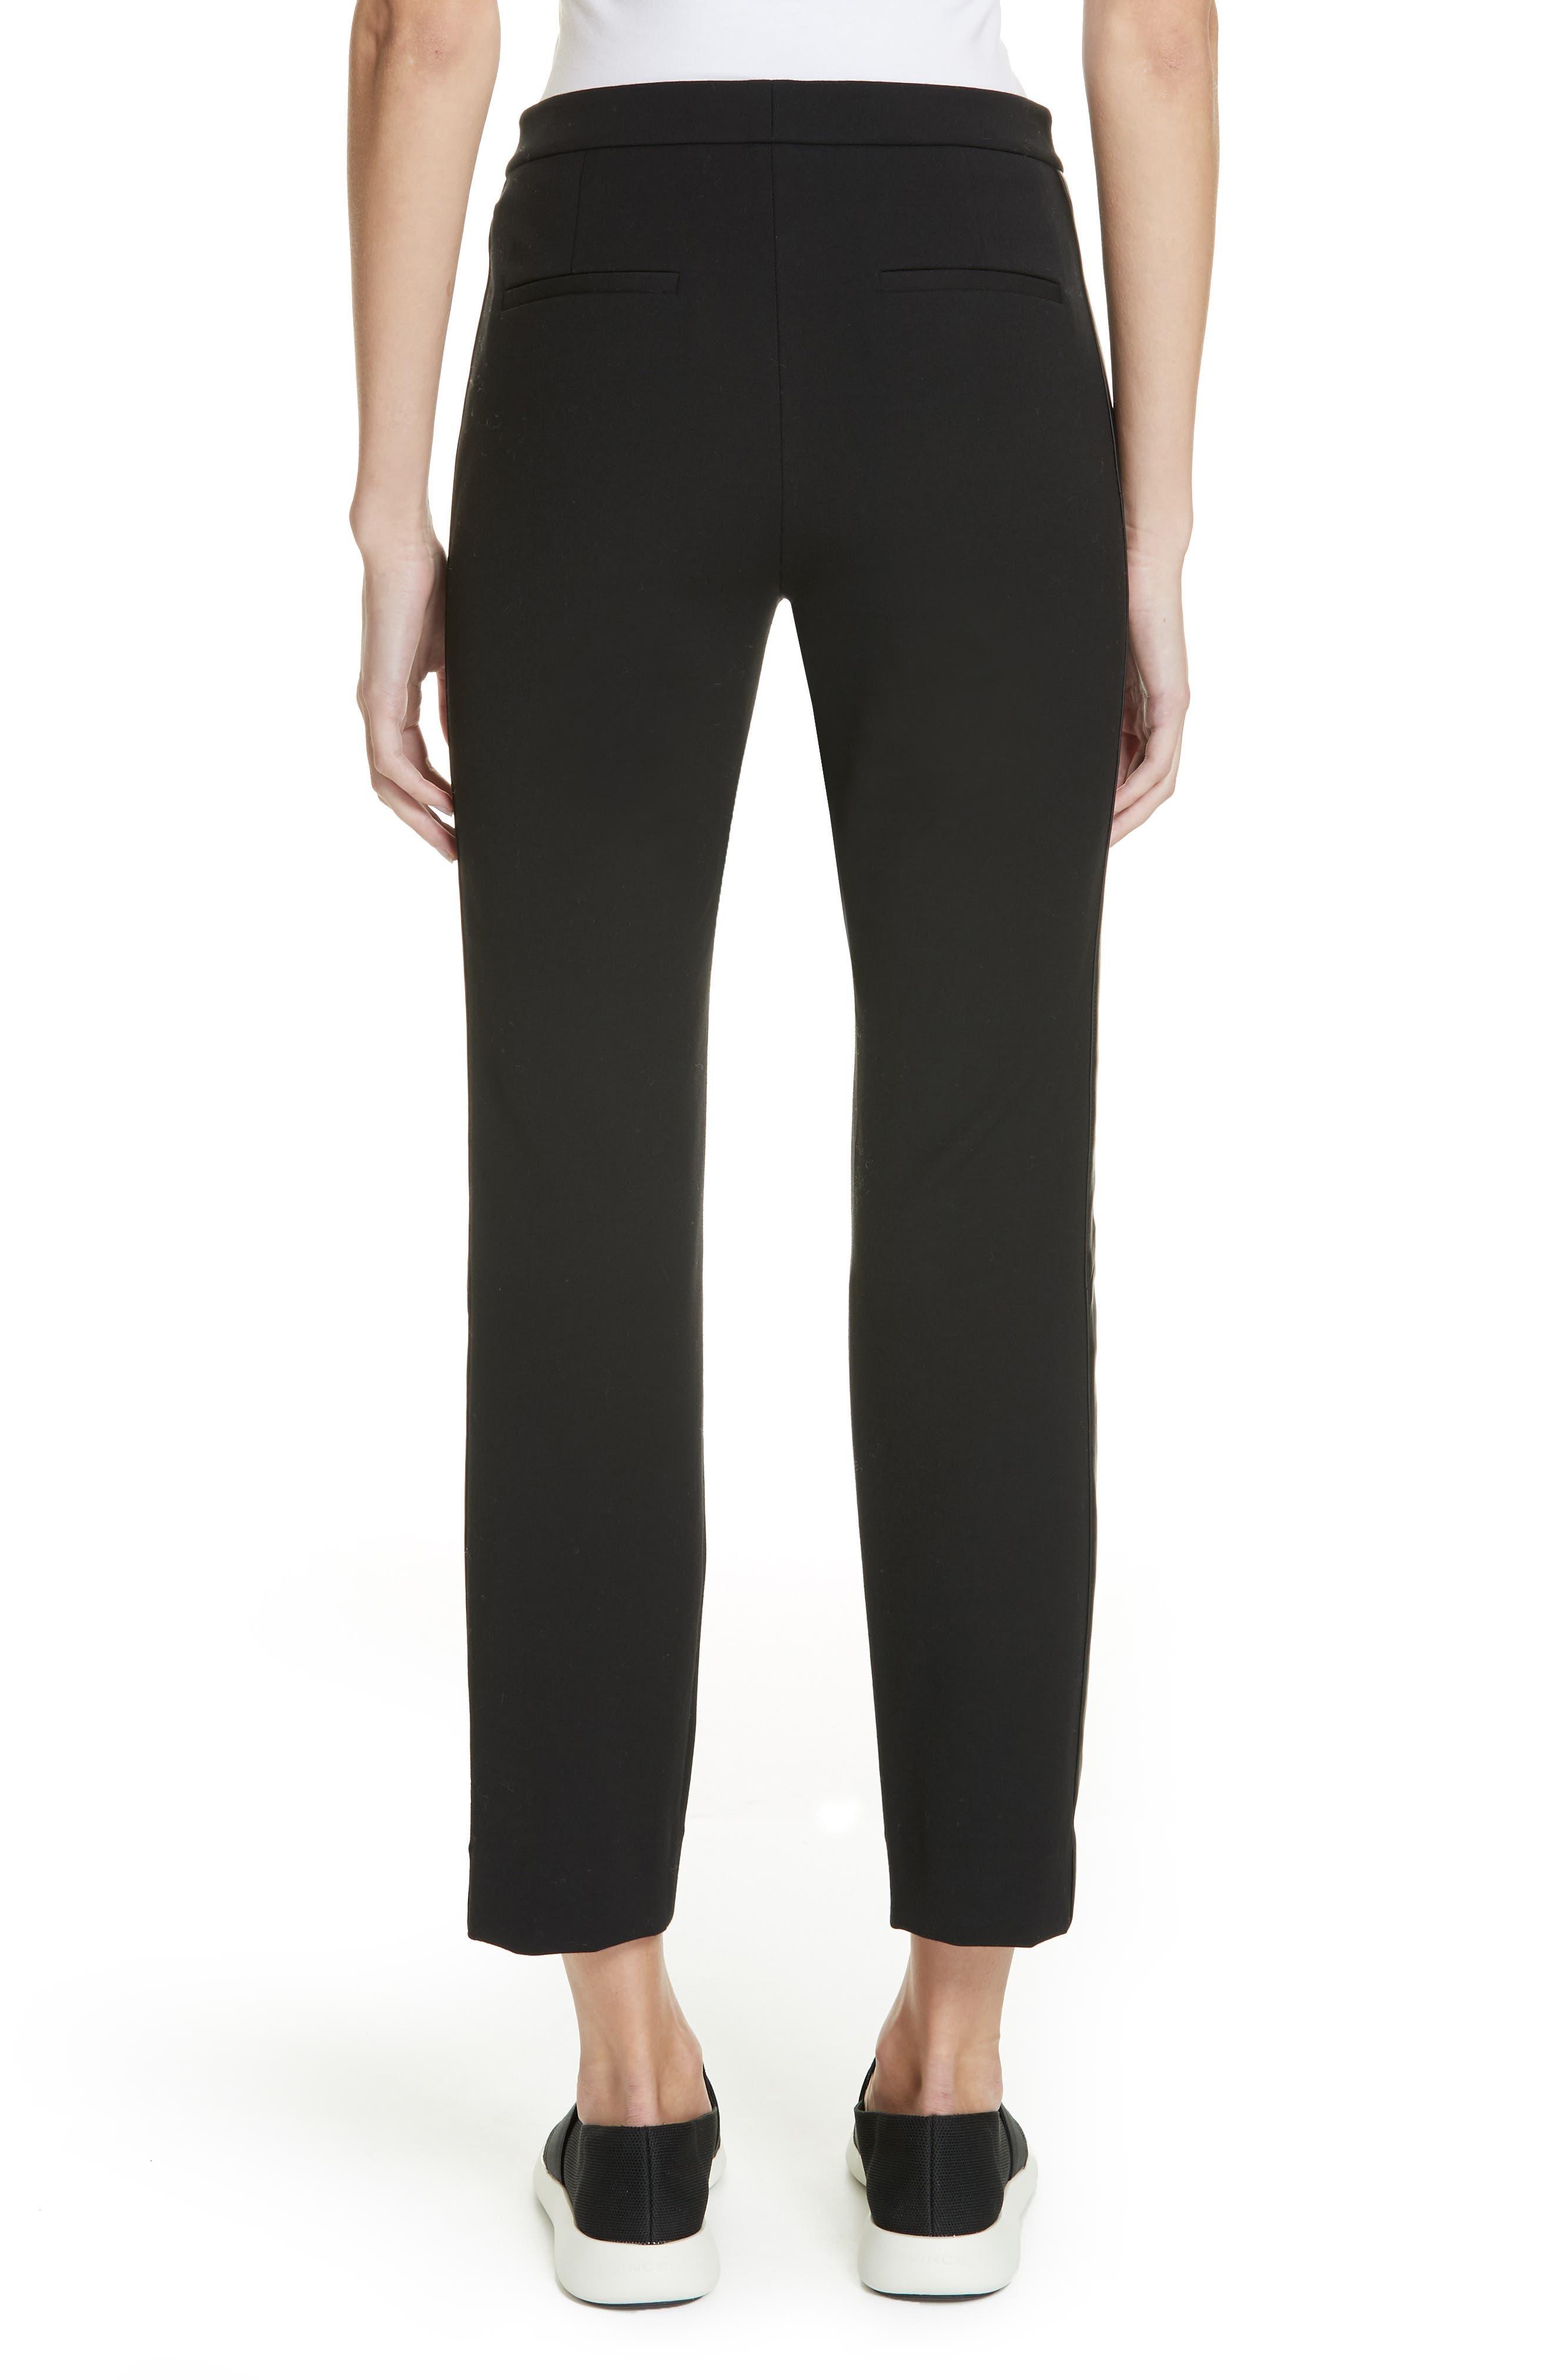 VINCE, Faux Leather Side Stripe Trousers, Alternate thumbnail 2, color, BLACK